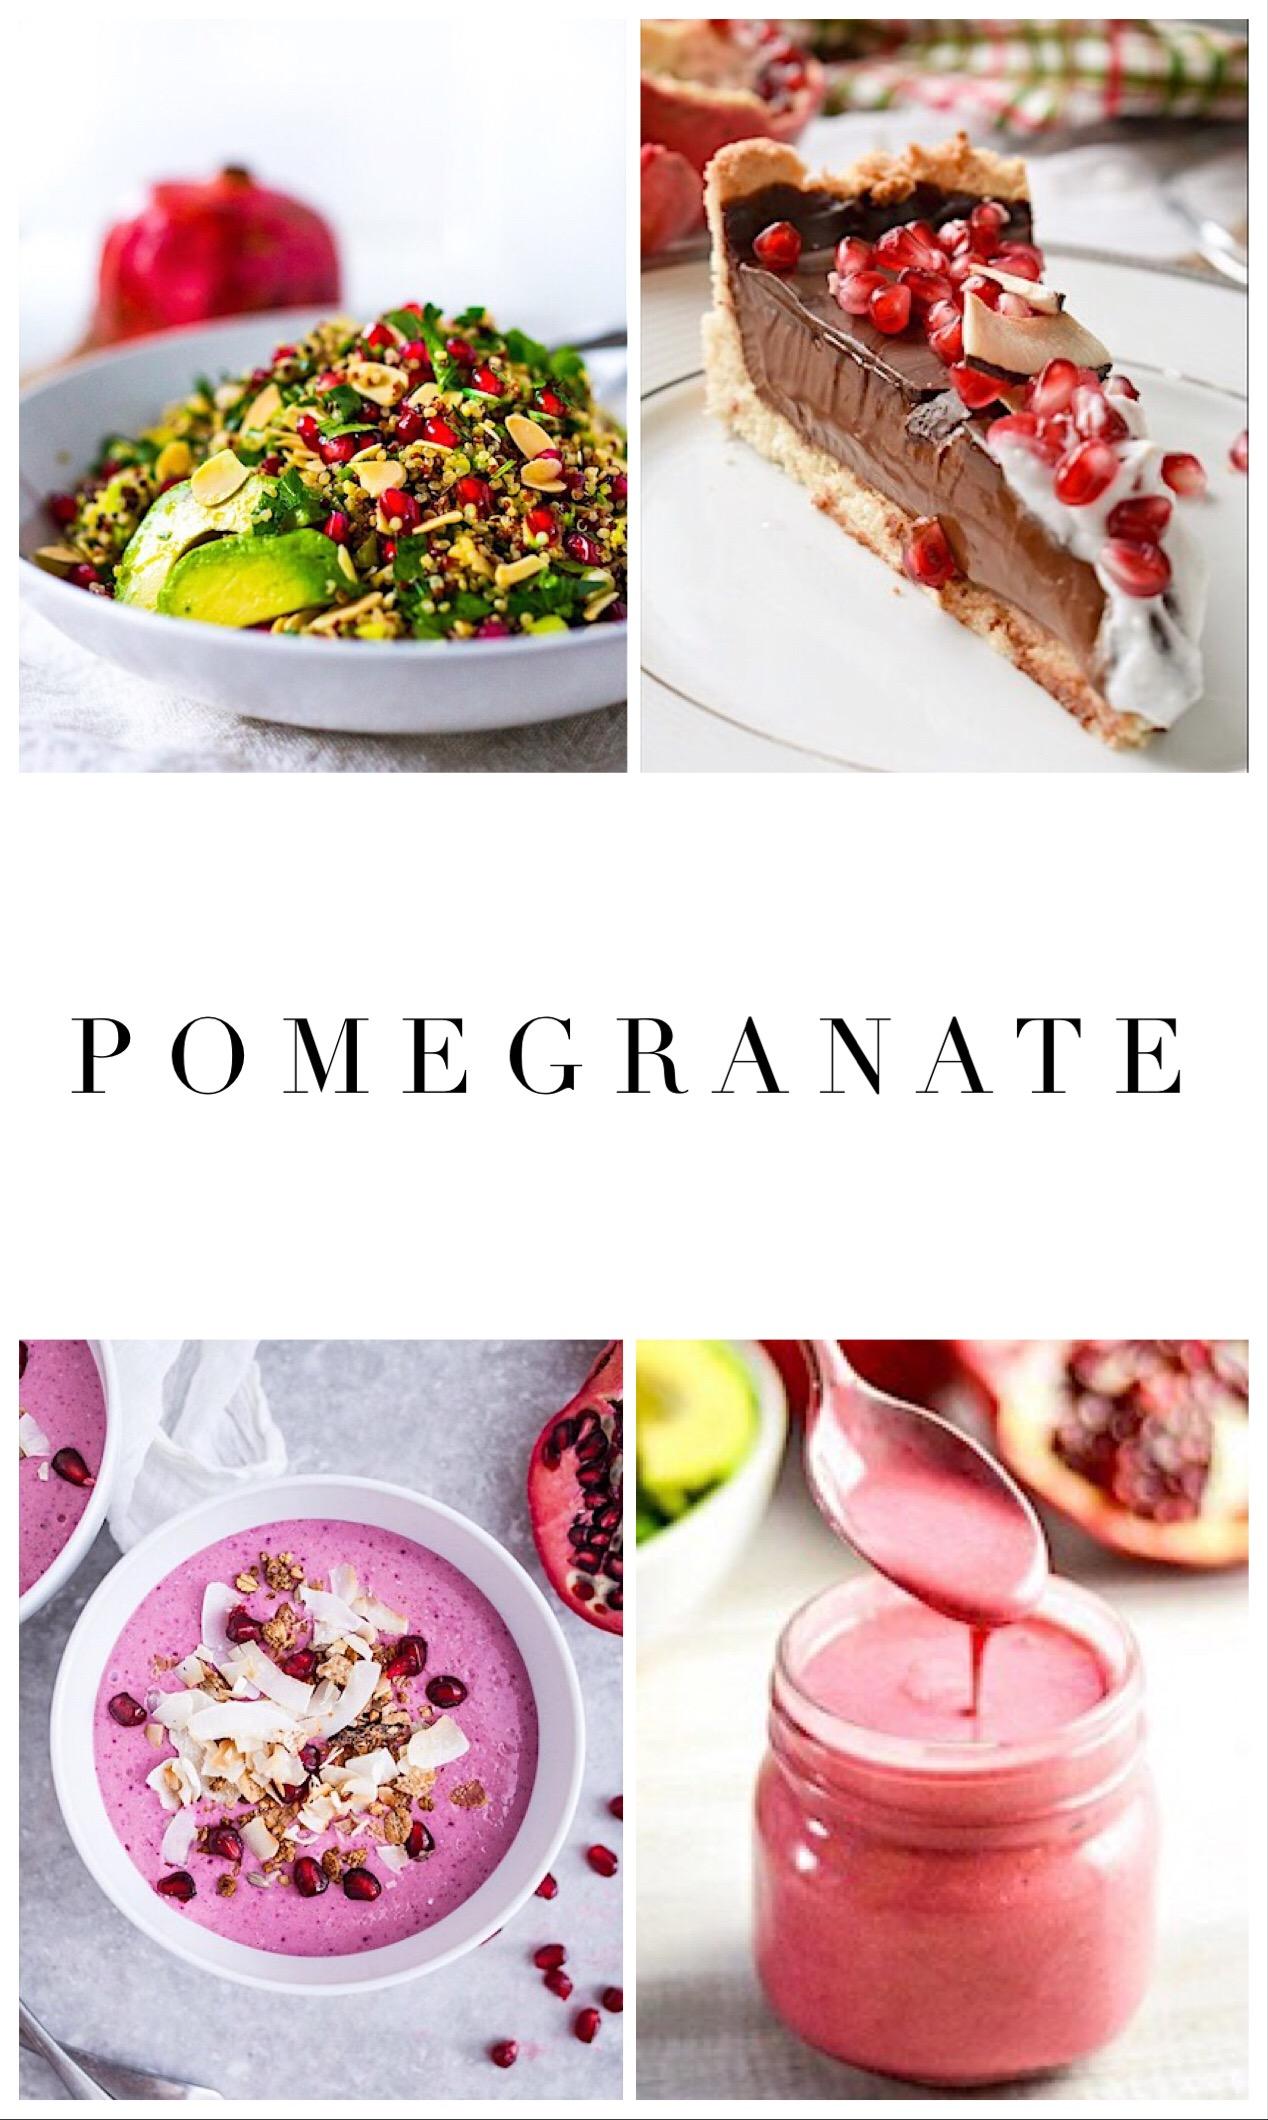 1.    Holiday crunch salad   , 2.    Chocolate pomegranate tart   ,  3.    Pomegranate smoothie bowl   , 4.    Pomegranate vinaigrette